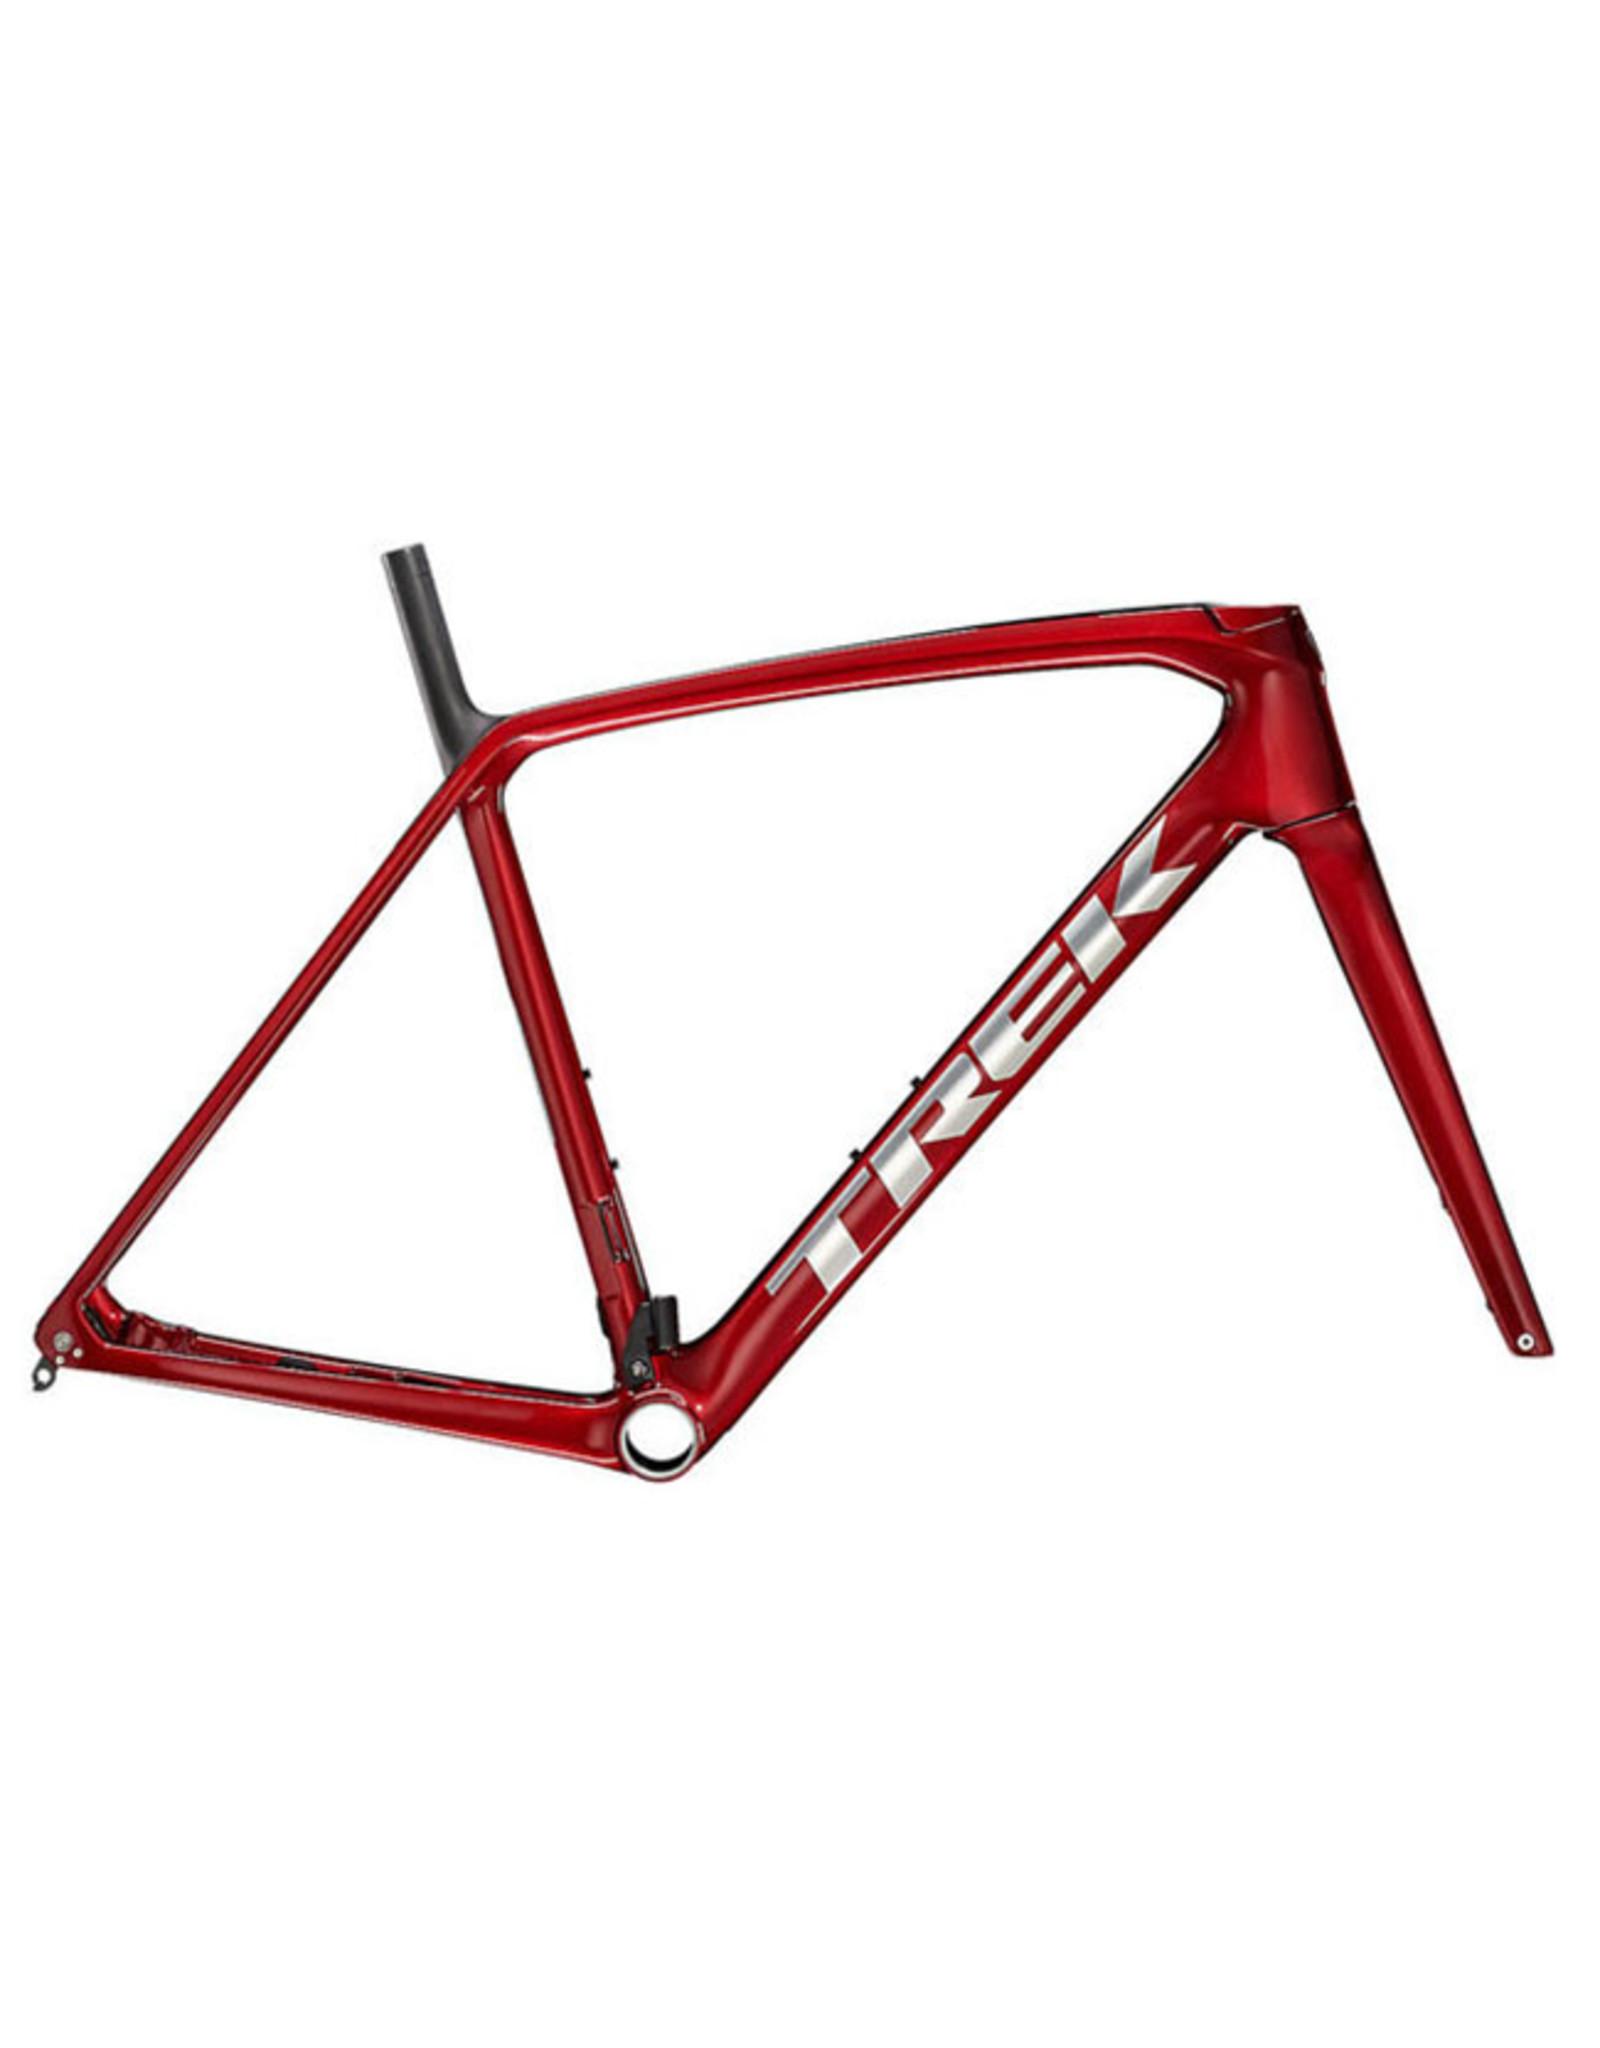 Trek Trek Bikes